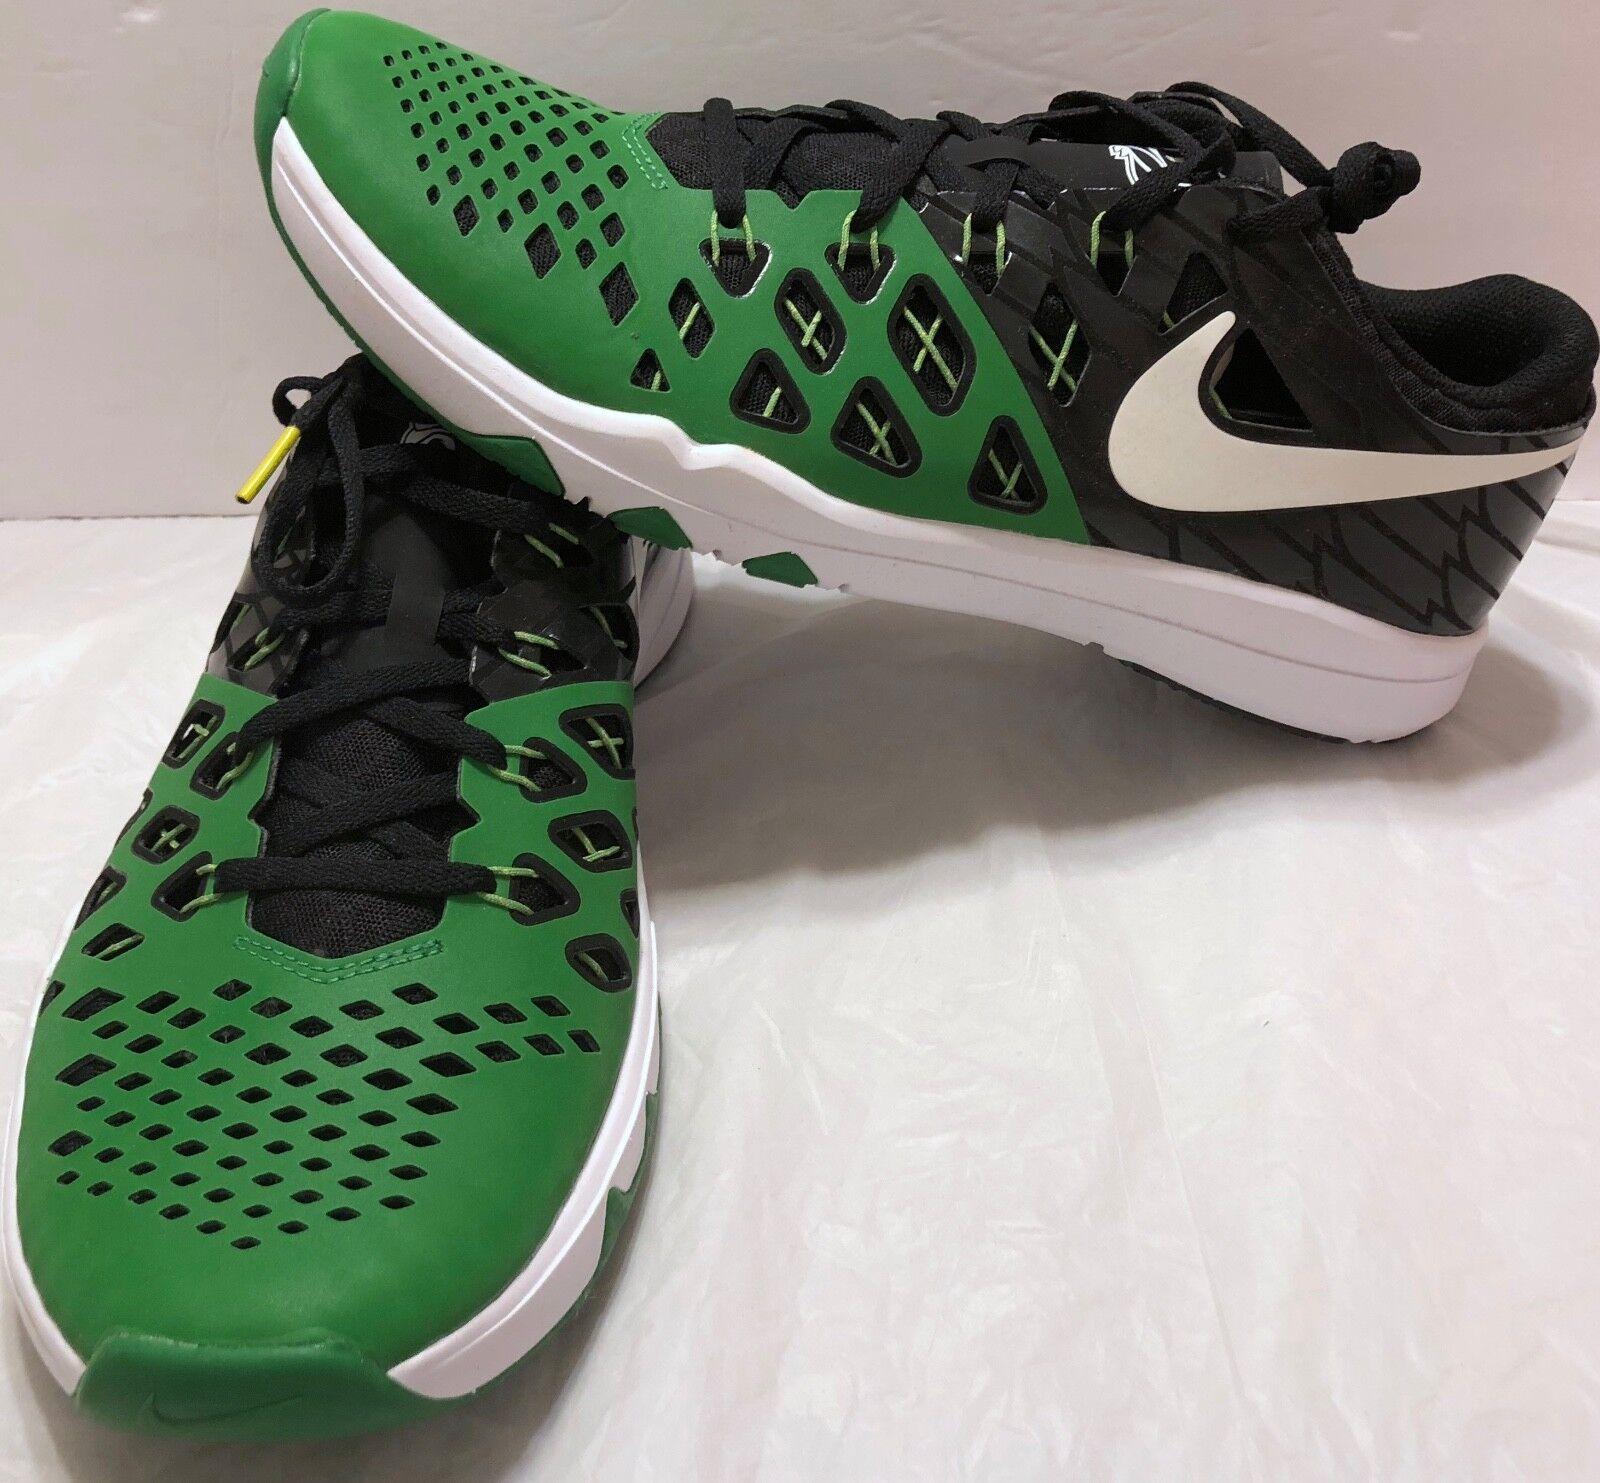 Nike Train Speed 4 AMP Oregon Ducks Shoes Sz 844102 11.5 Apple Green 844102 Sz 301 Train 4d38a1